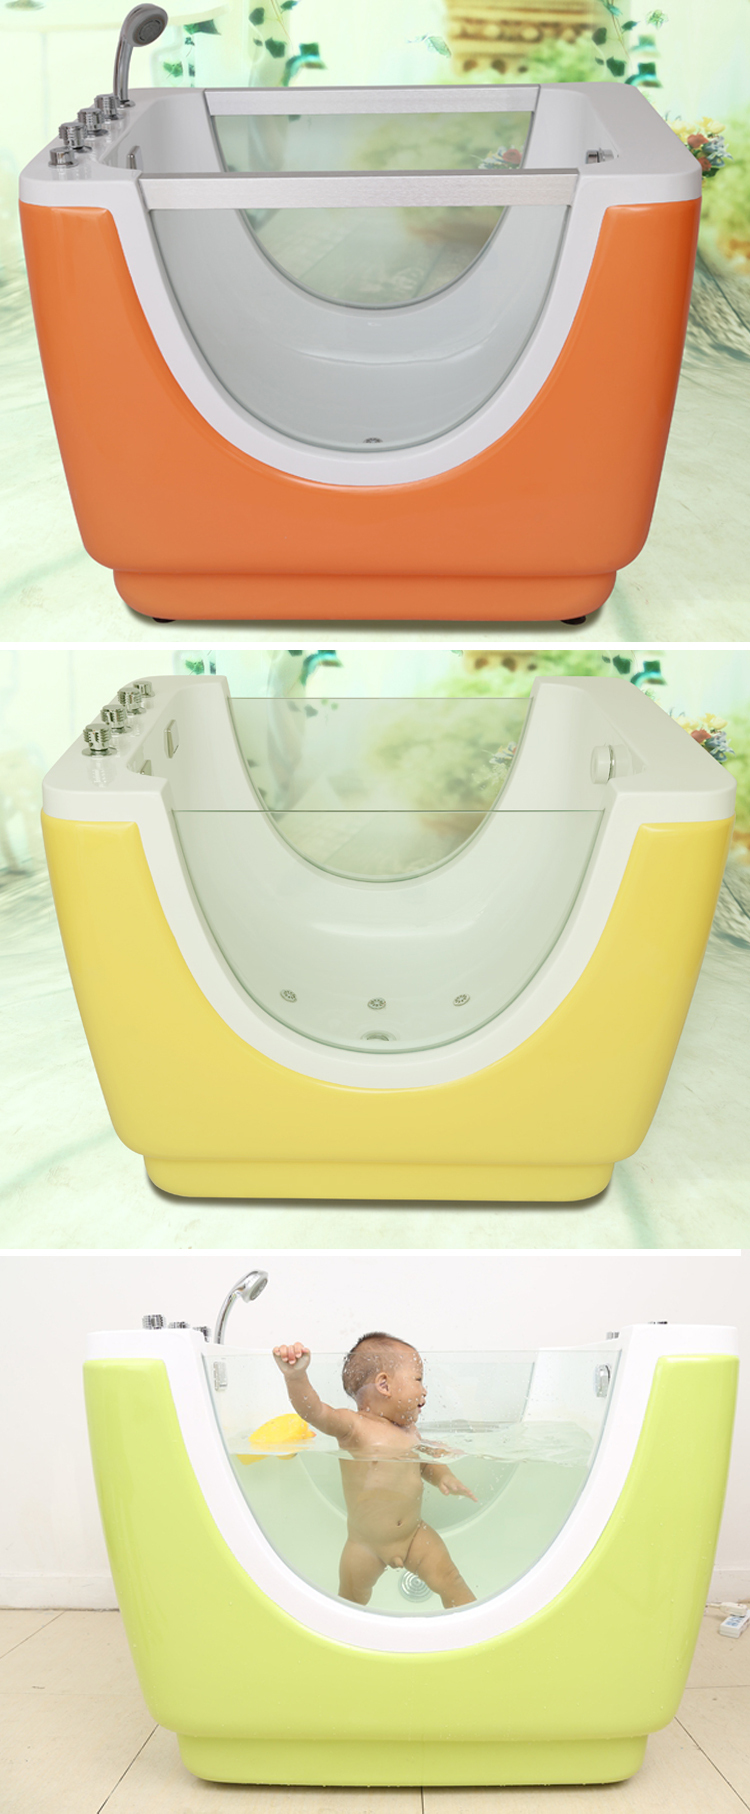 Cool Baby Jacuzzi Bathtub Gallery - The Best Bathroom Ideas - lapoup.com